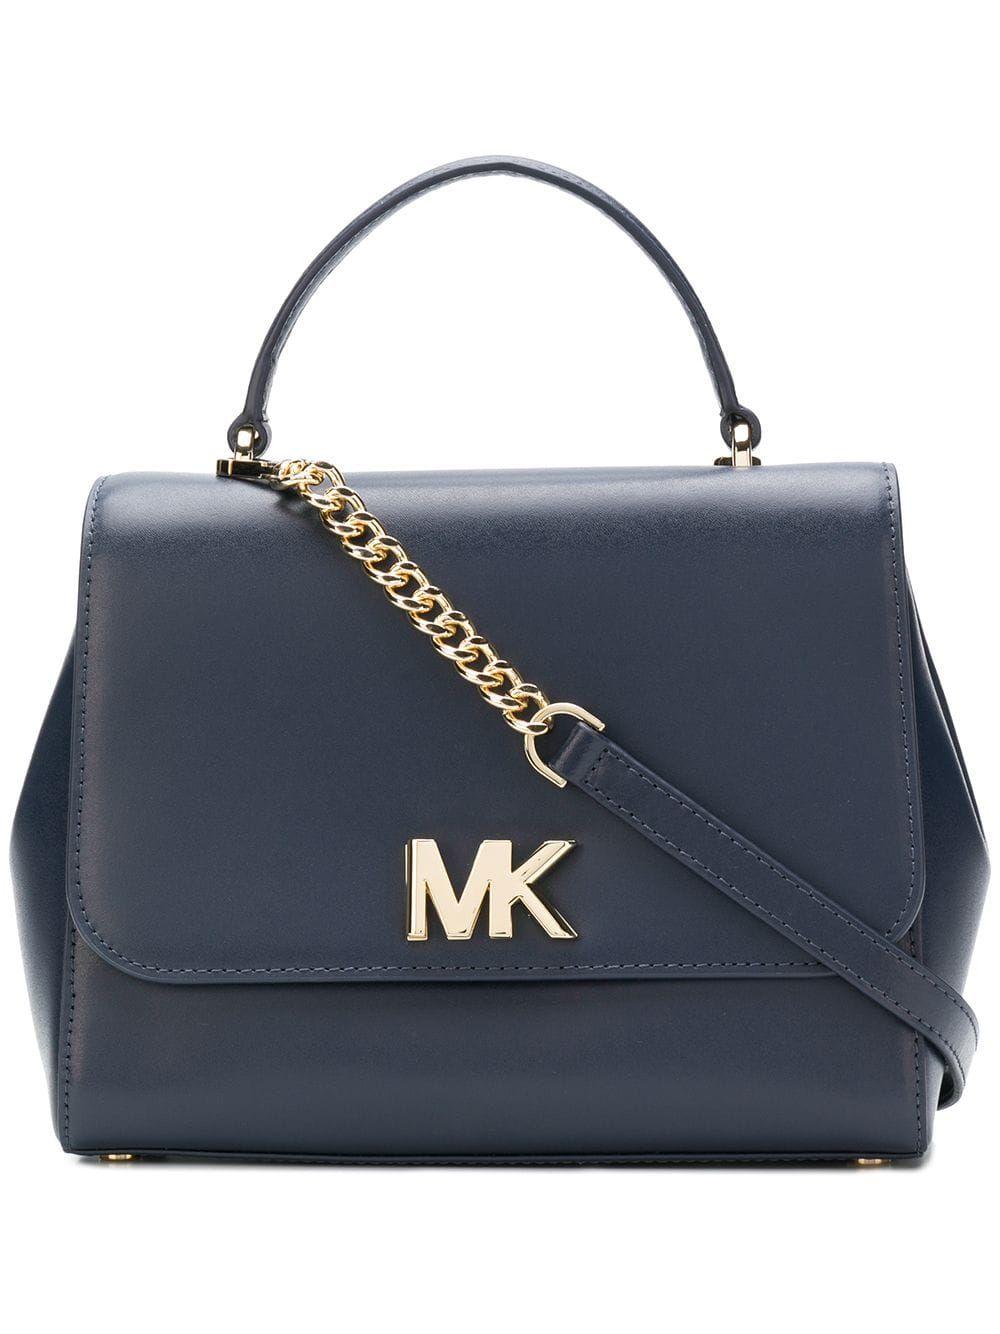 Michael Michael Kors Mott Satchel Bag Handbags Michael Kors Michael Kors Michael Kors Bag